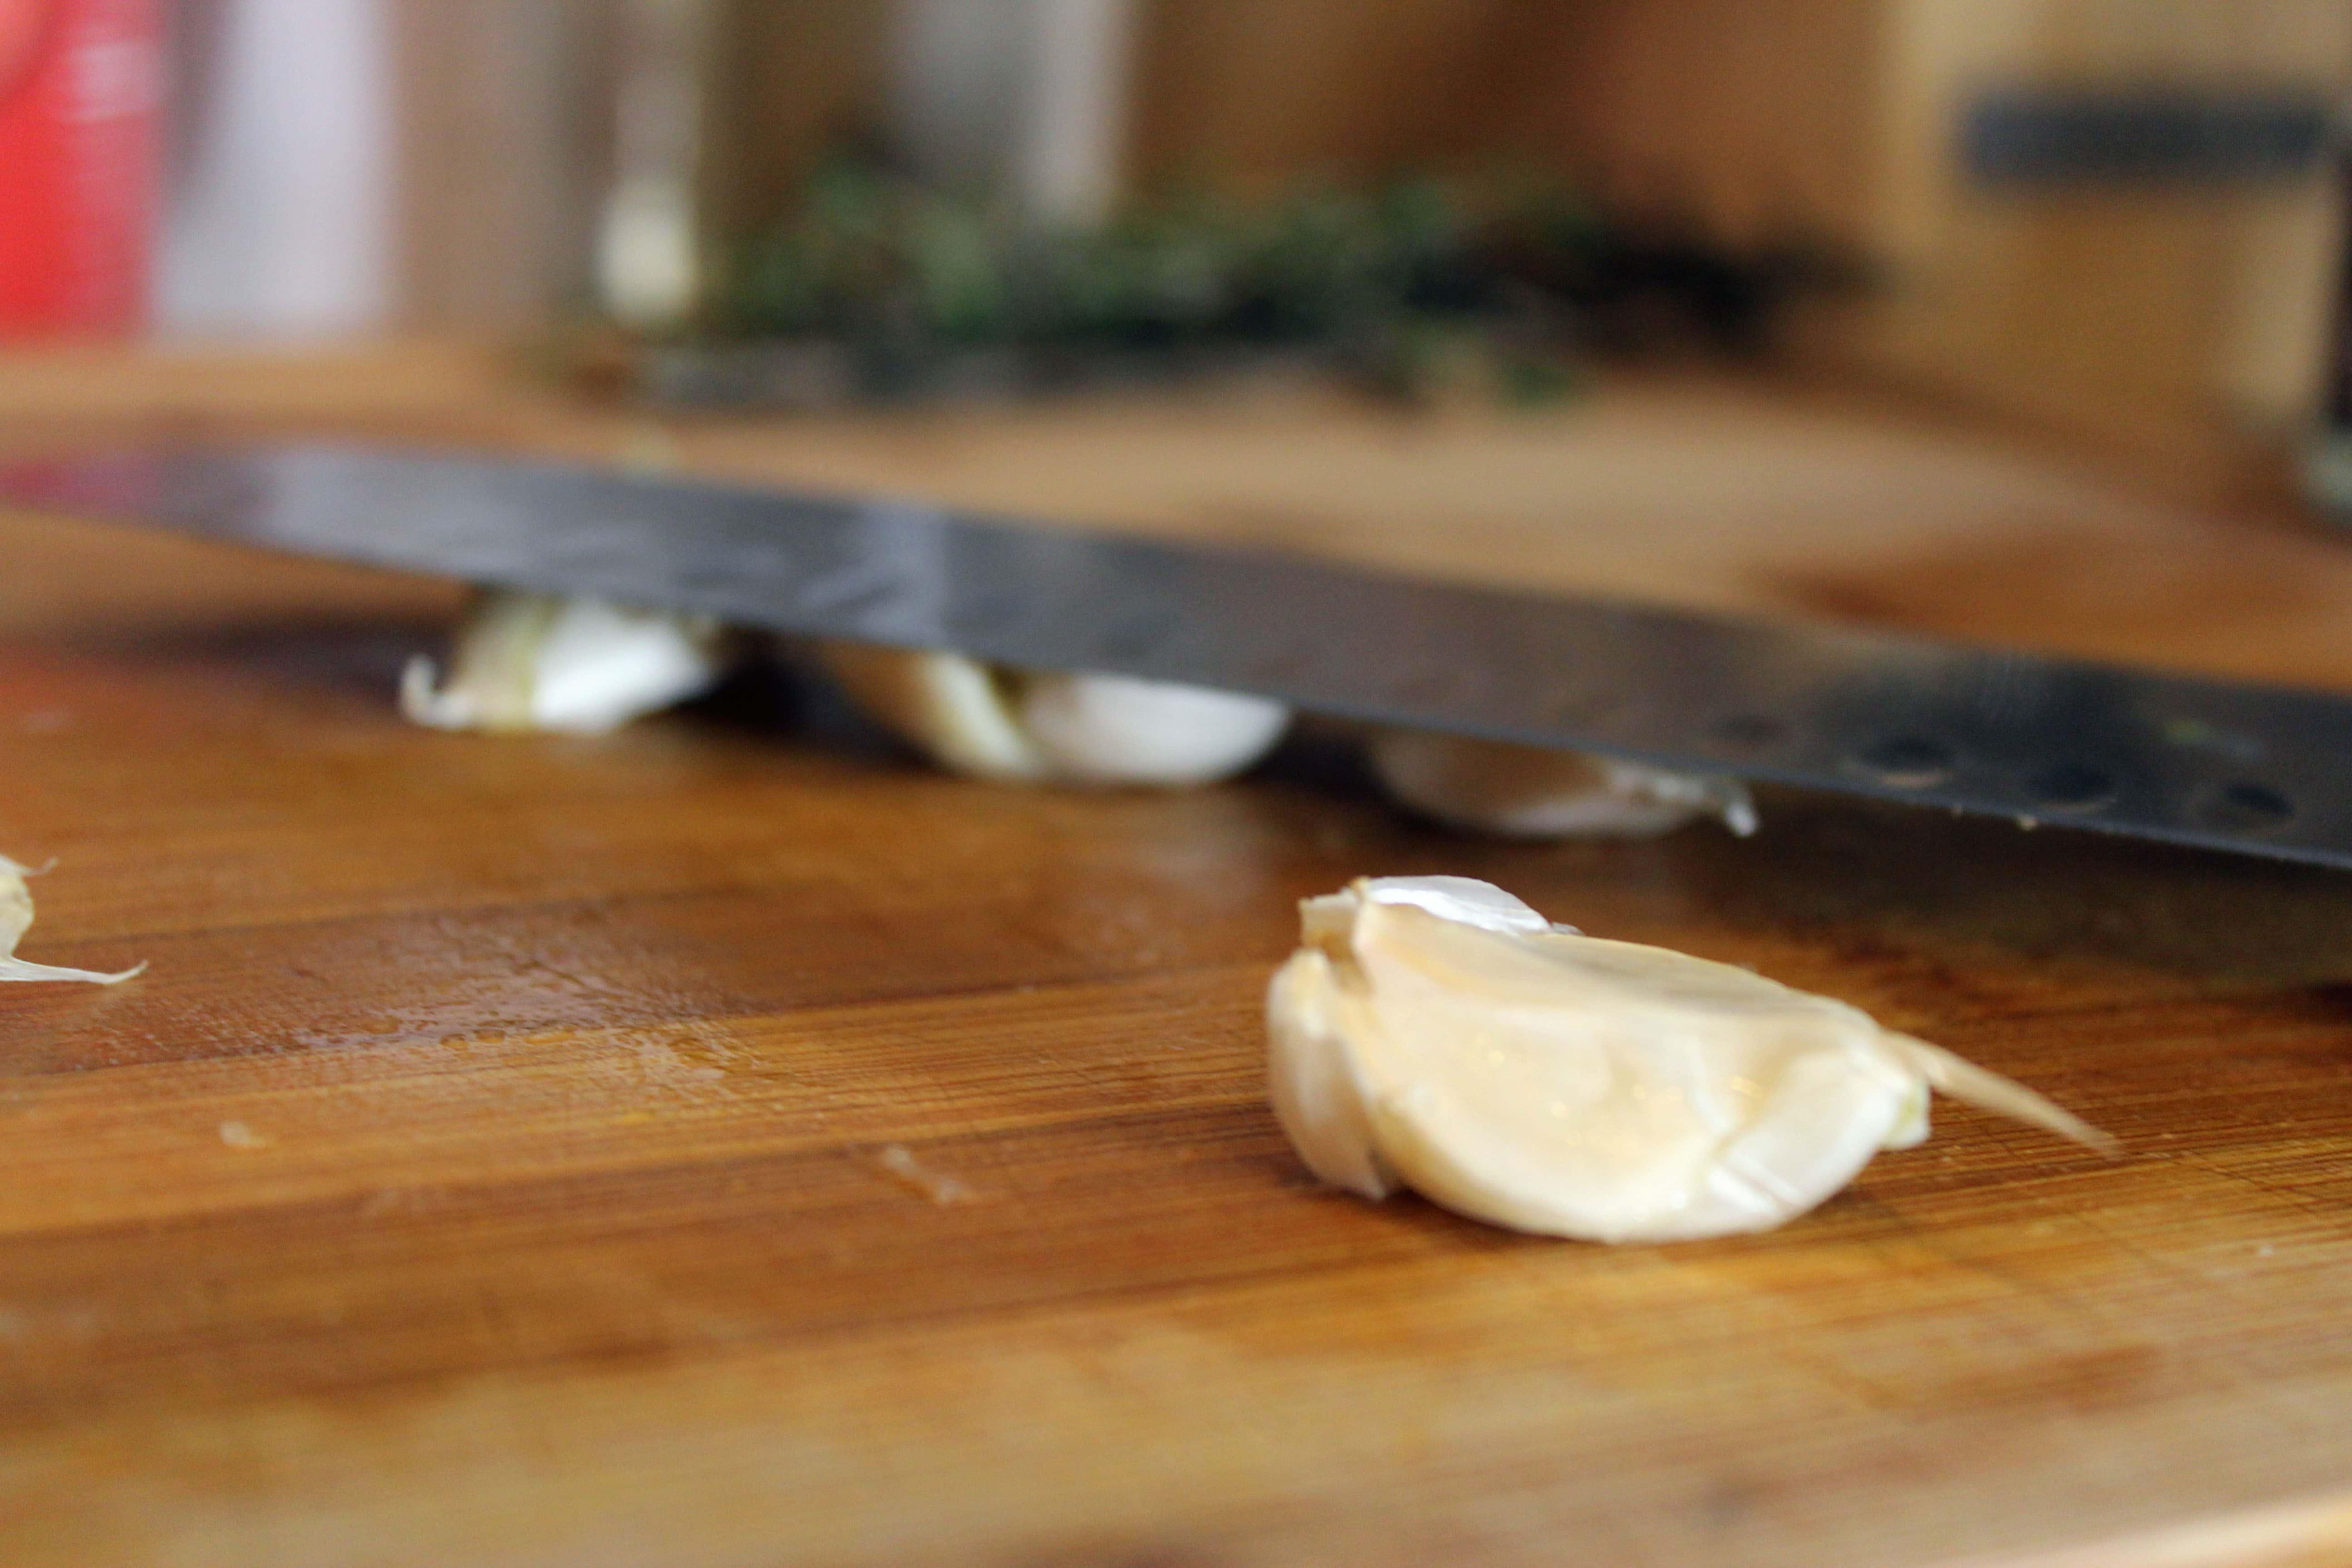 Smash the garlic